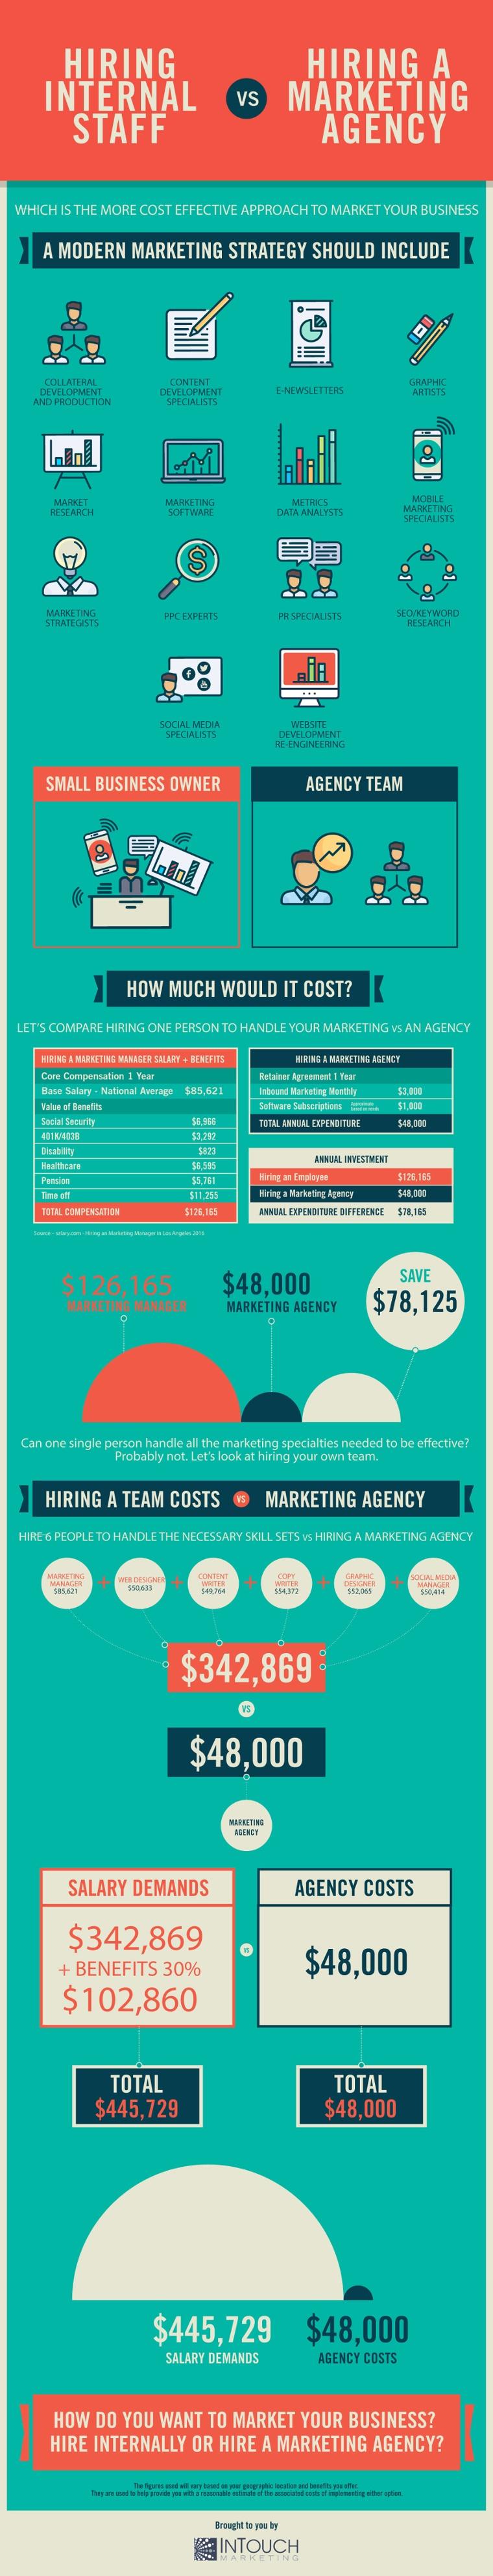 Hiring Internal Staff vs Hiring a Marketing Agency by Intouch Marketing